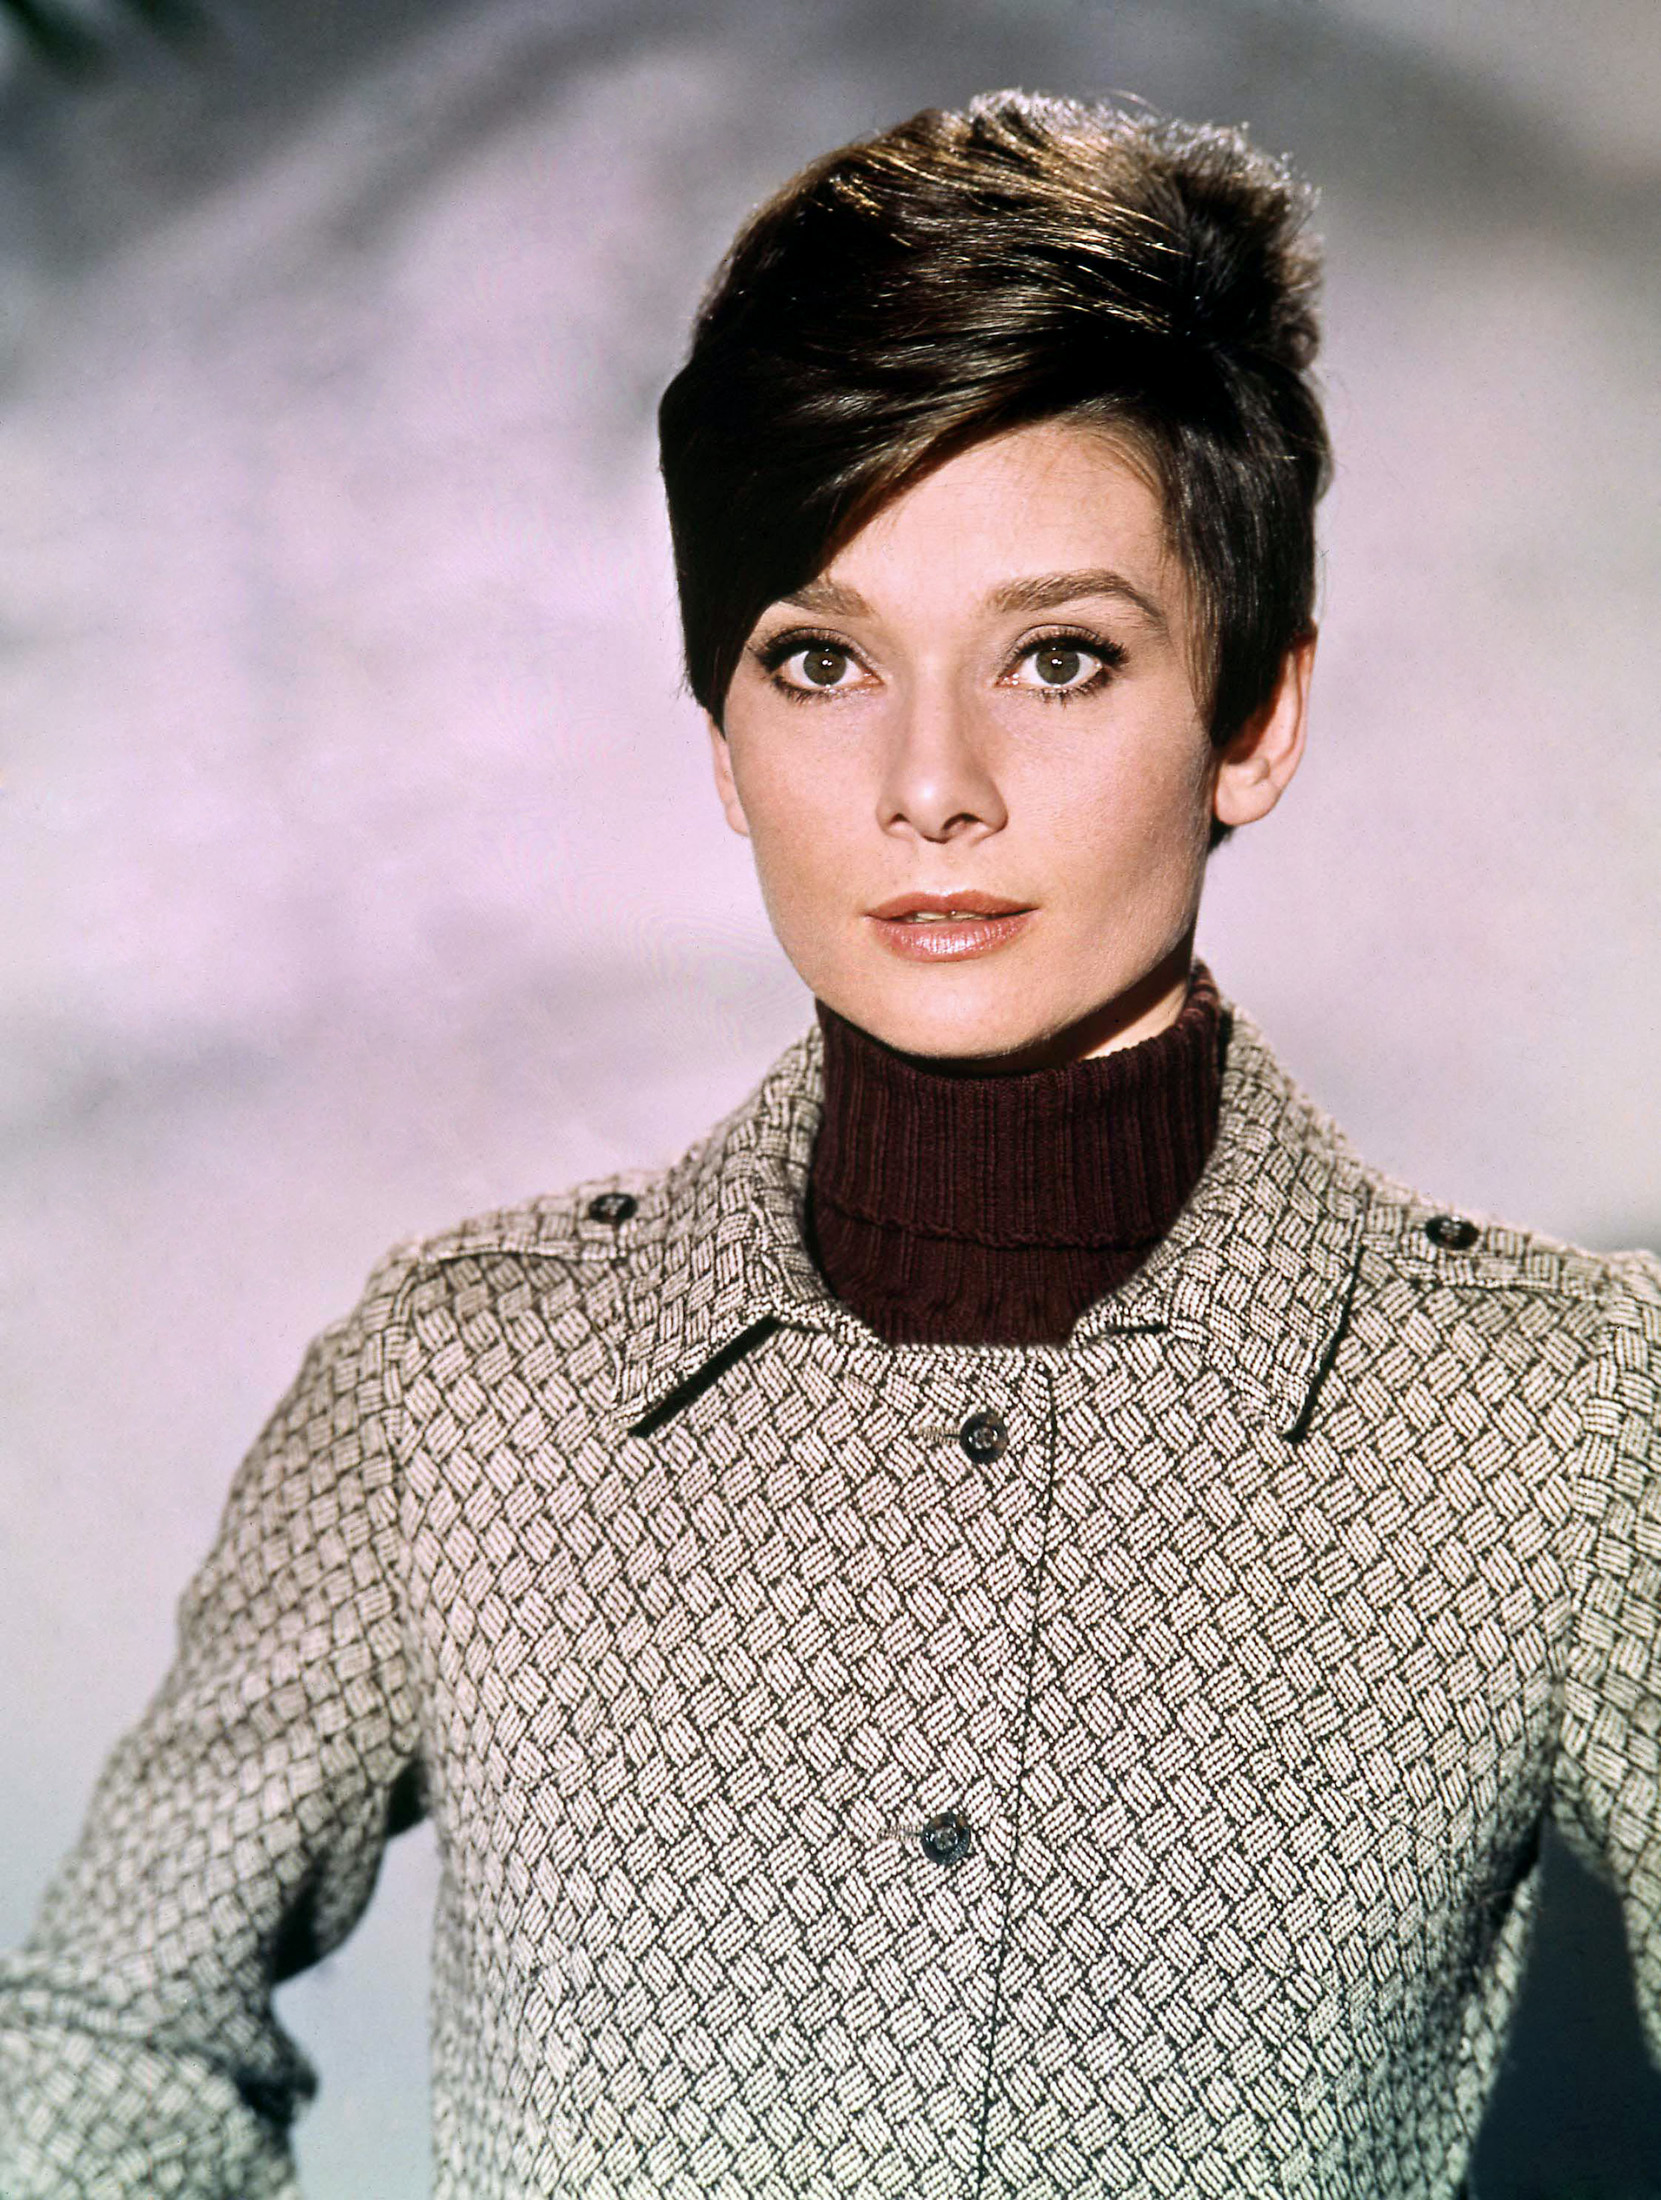 Audrey Hepburn Fashion, Style & Dresses | Fashion Tag Blog